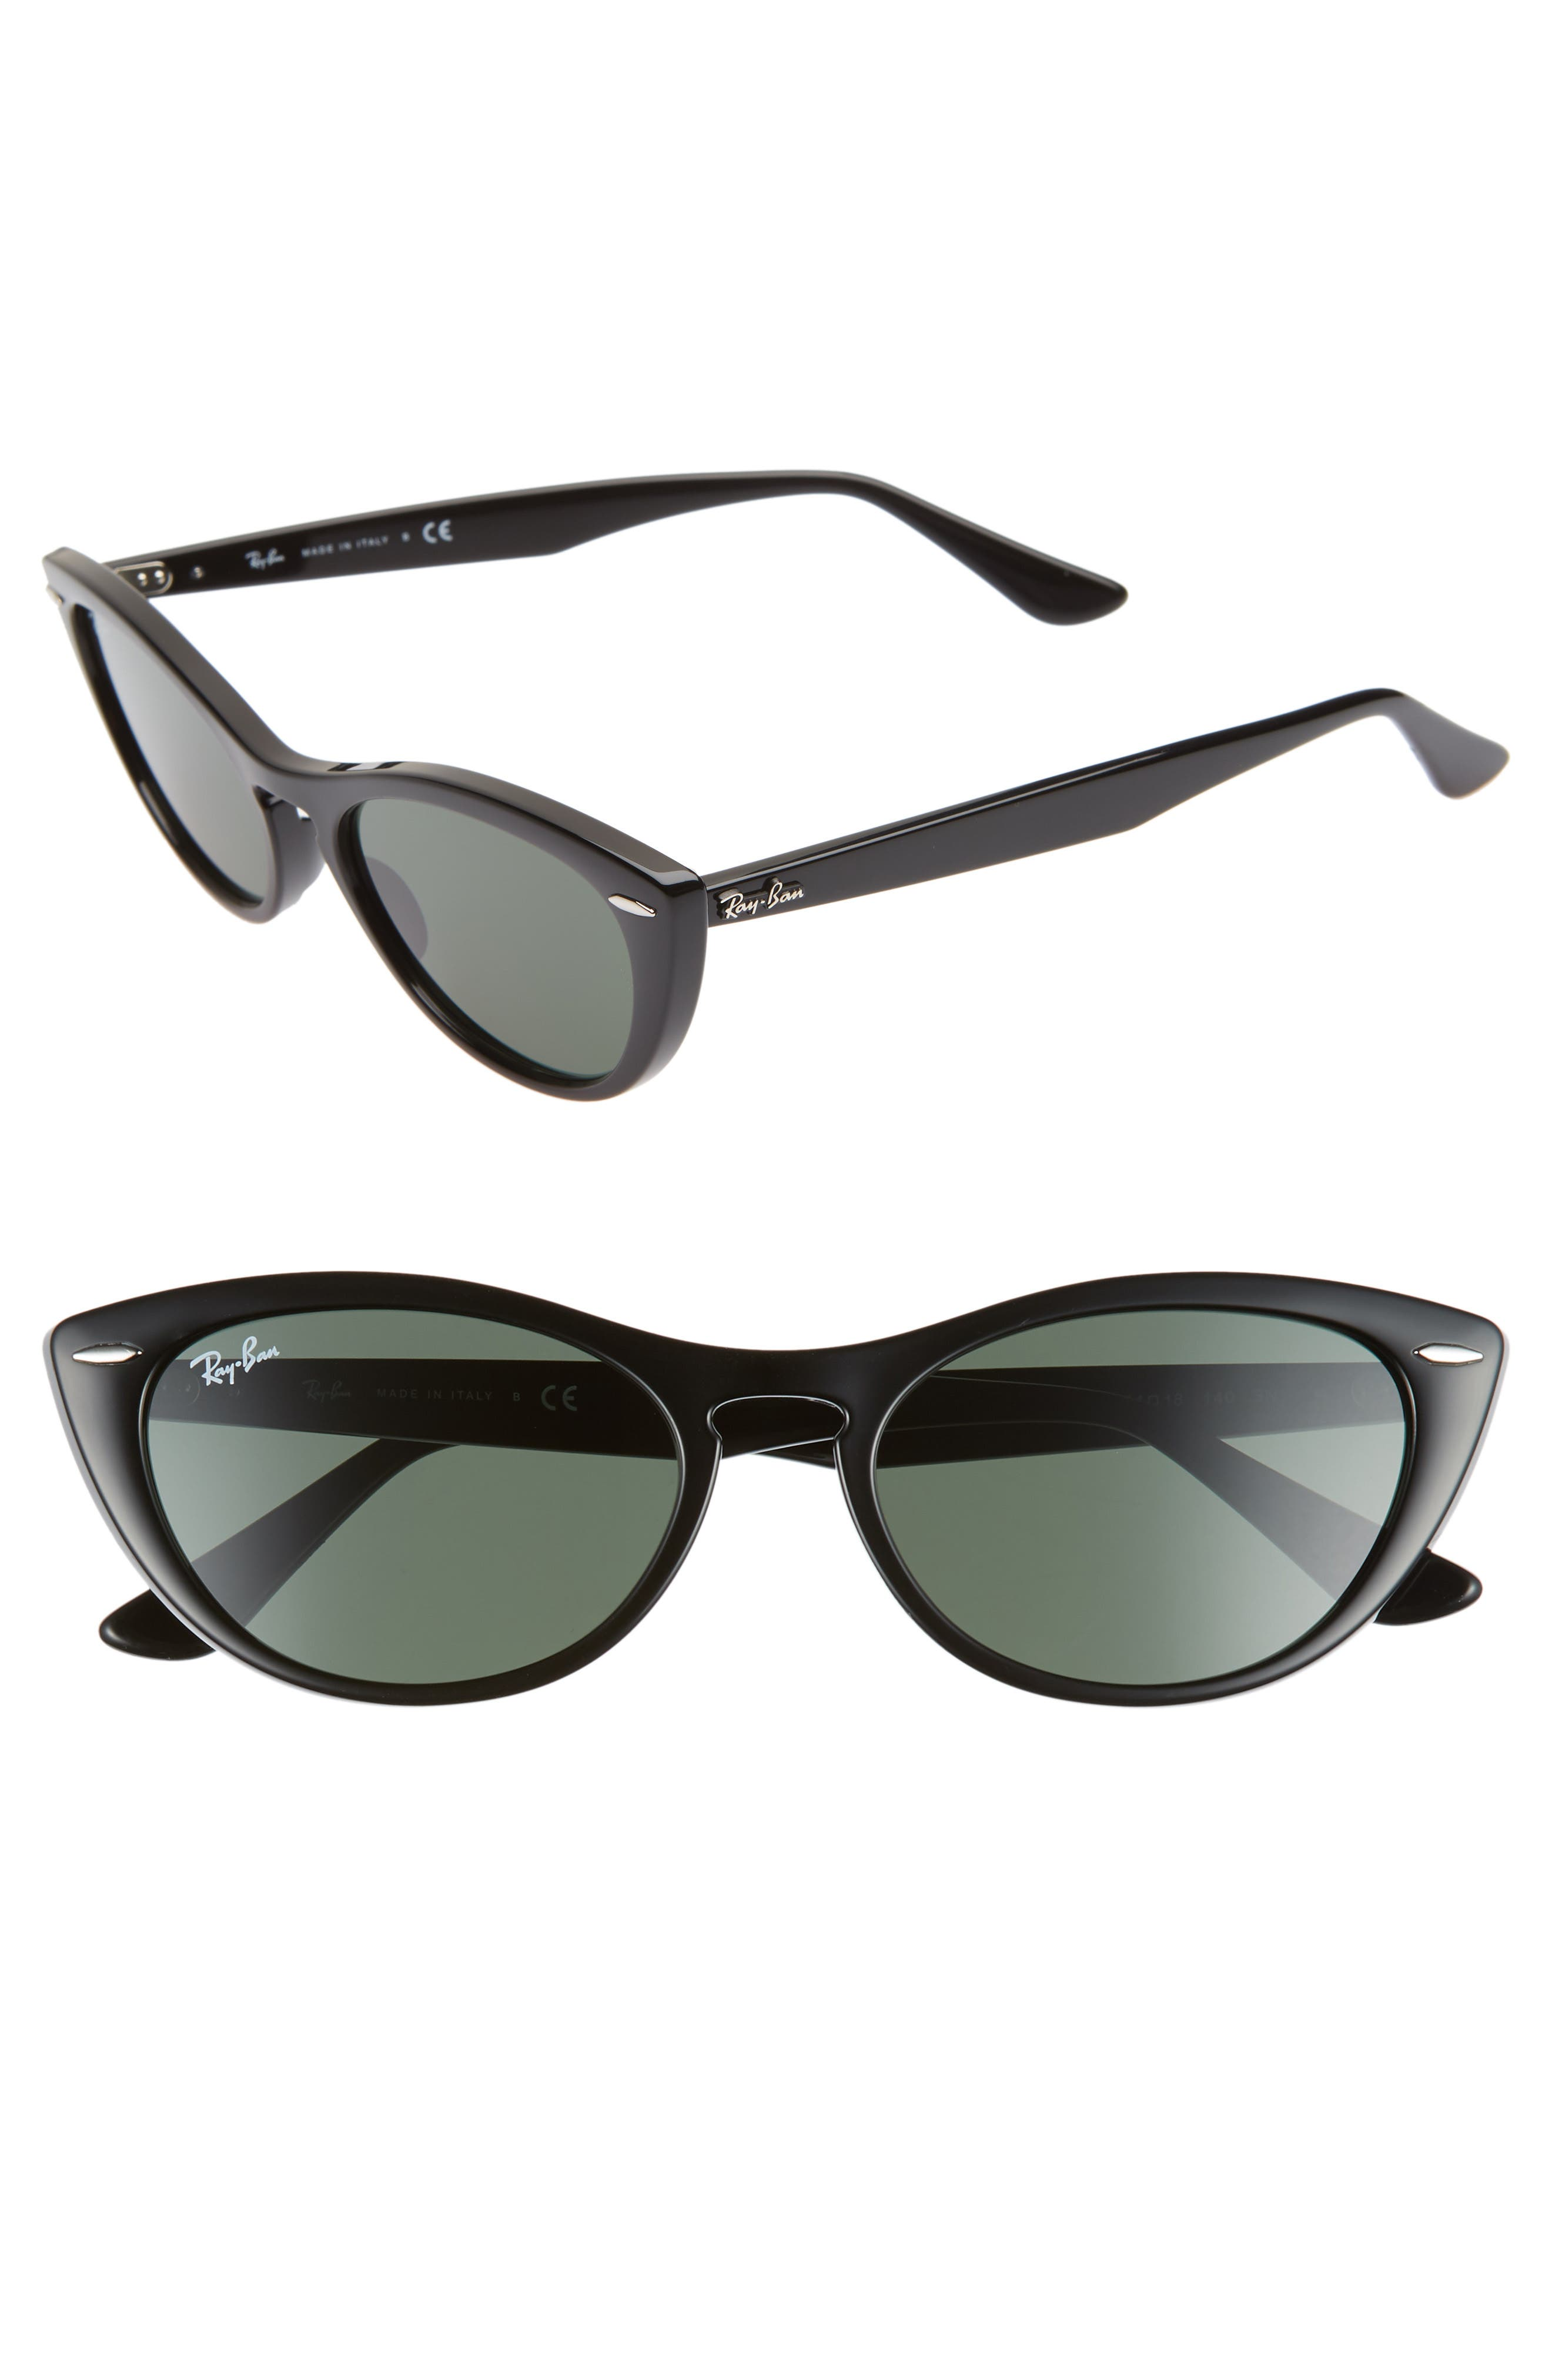 Ray-Ban Nina 5m Cat Eye Sunglasses - Black/ Green Solid